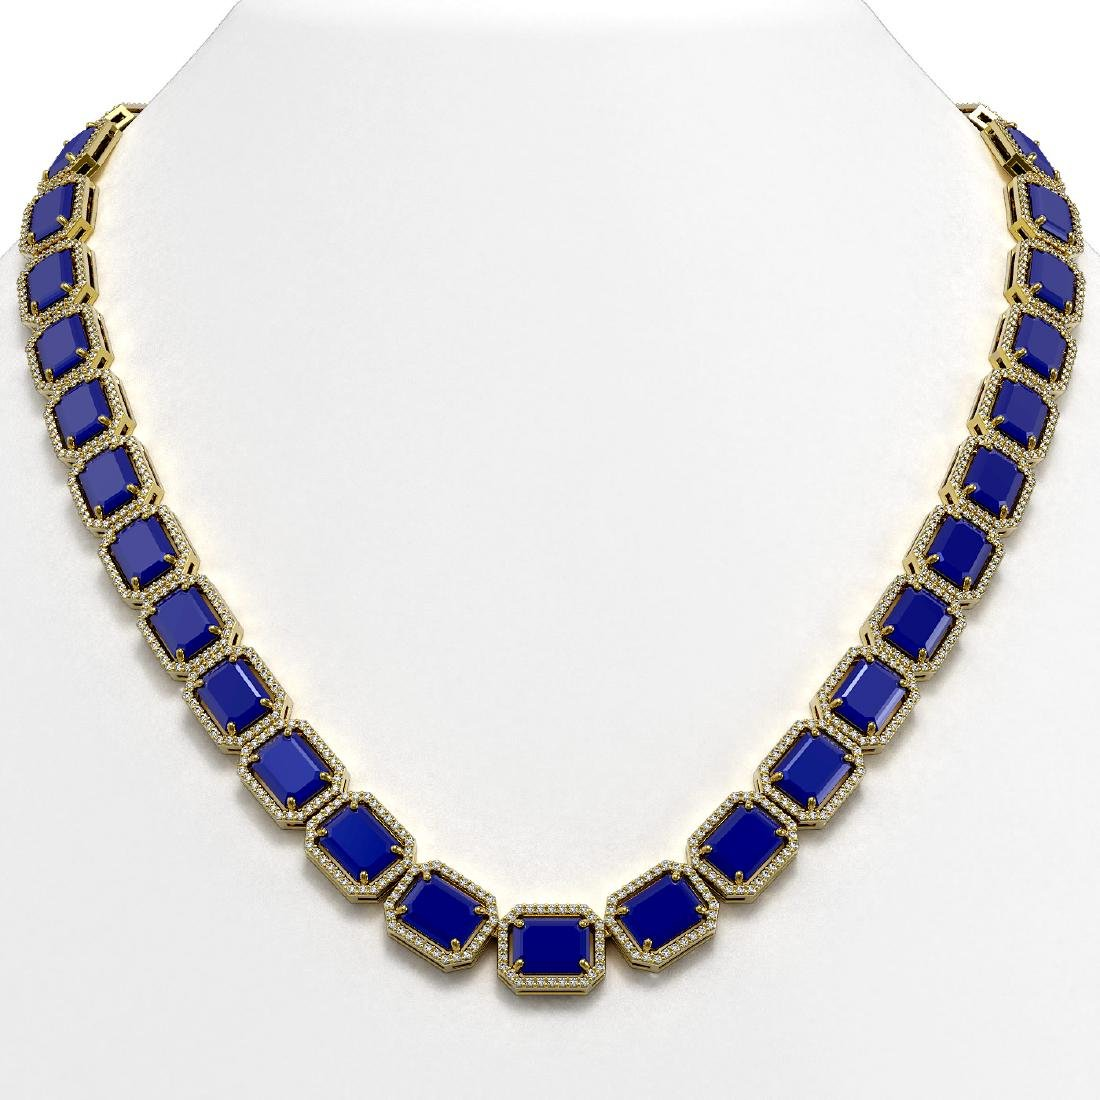 84.94 CTW Sapphire & Diamond Halo Necklace 10K Yellow